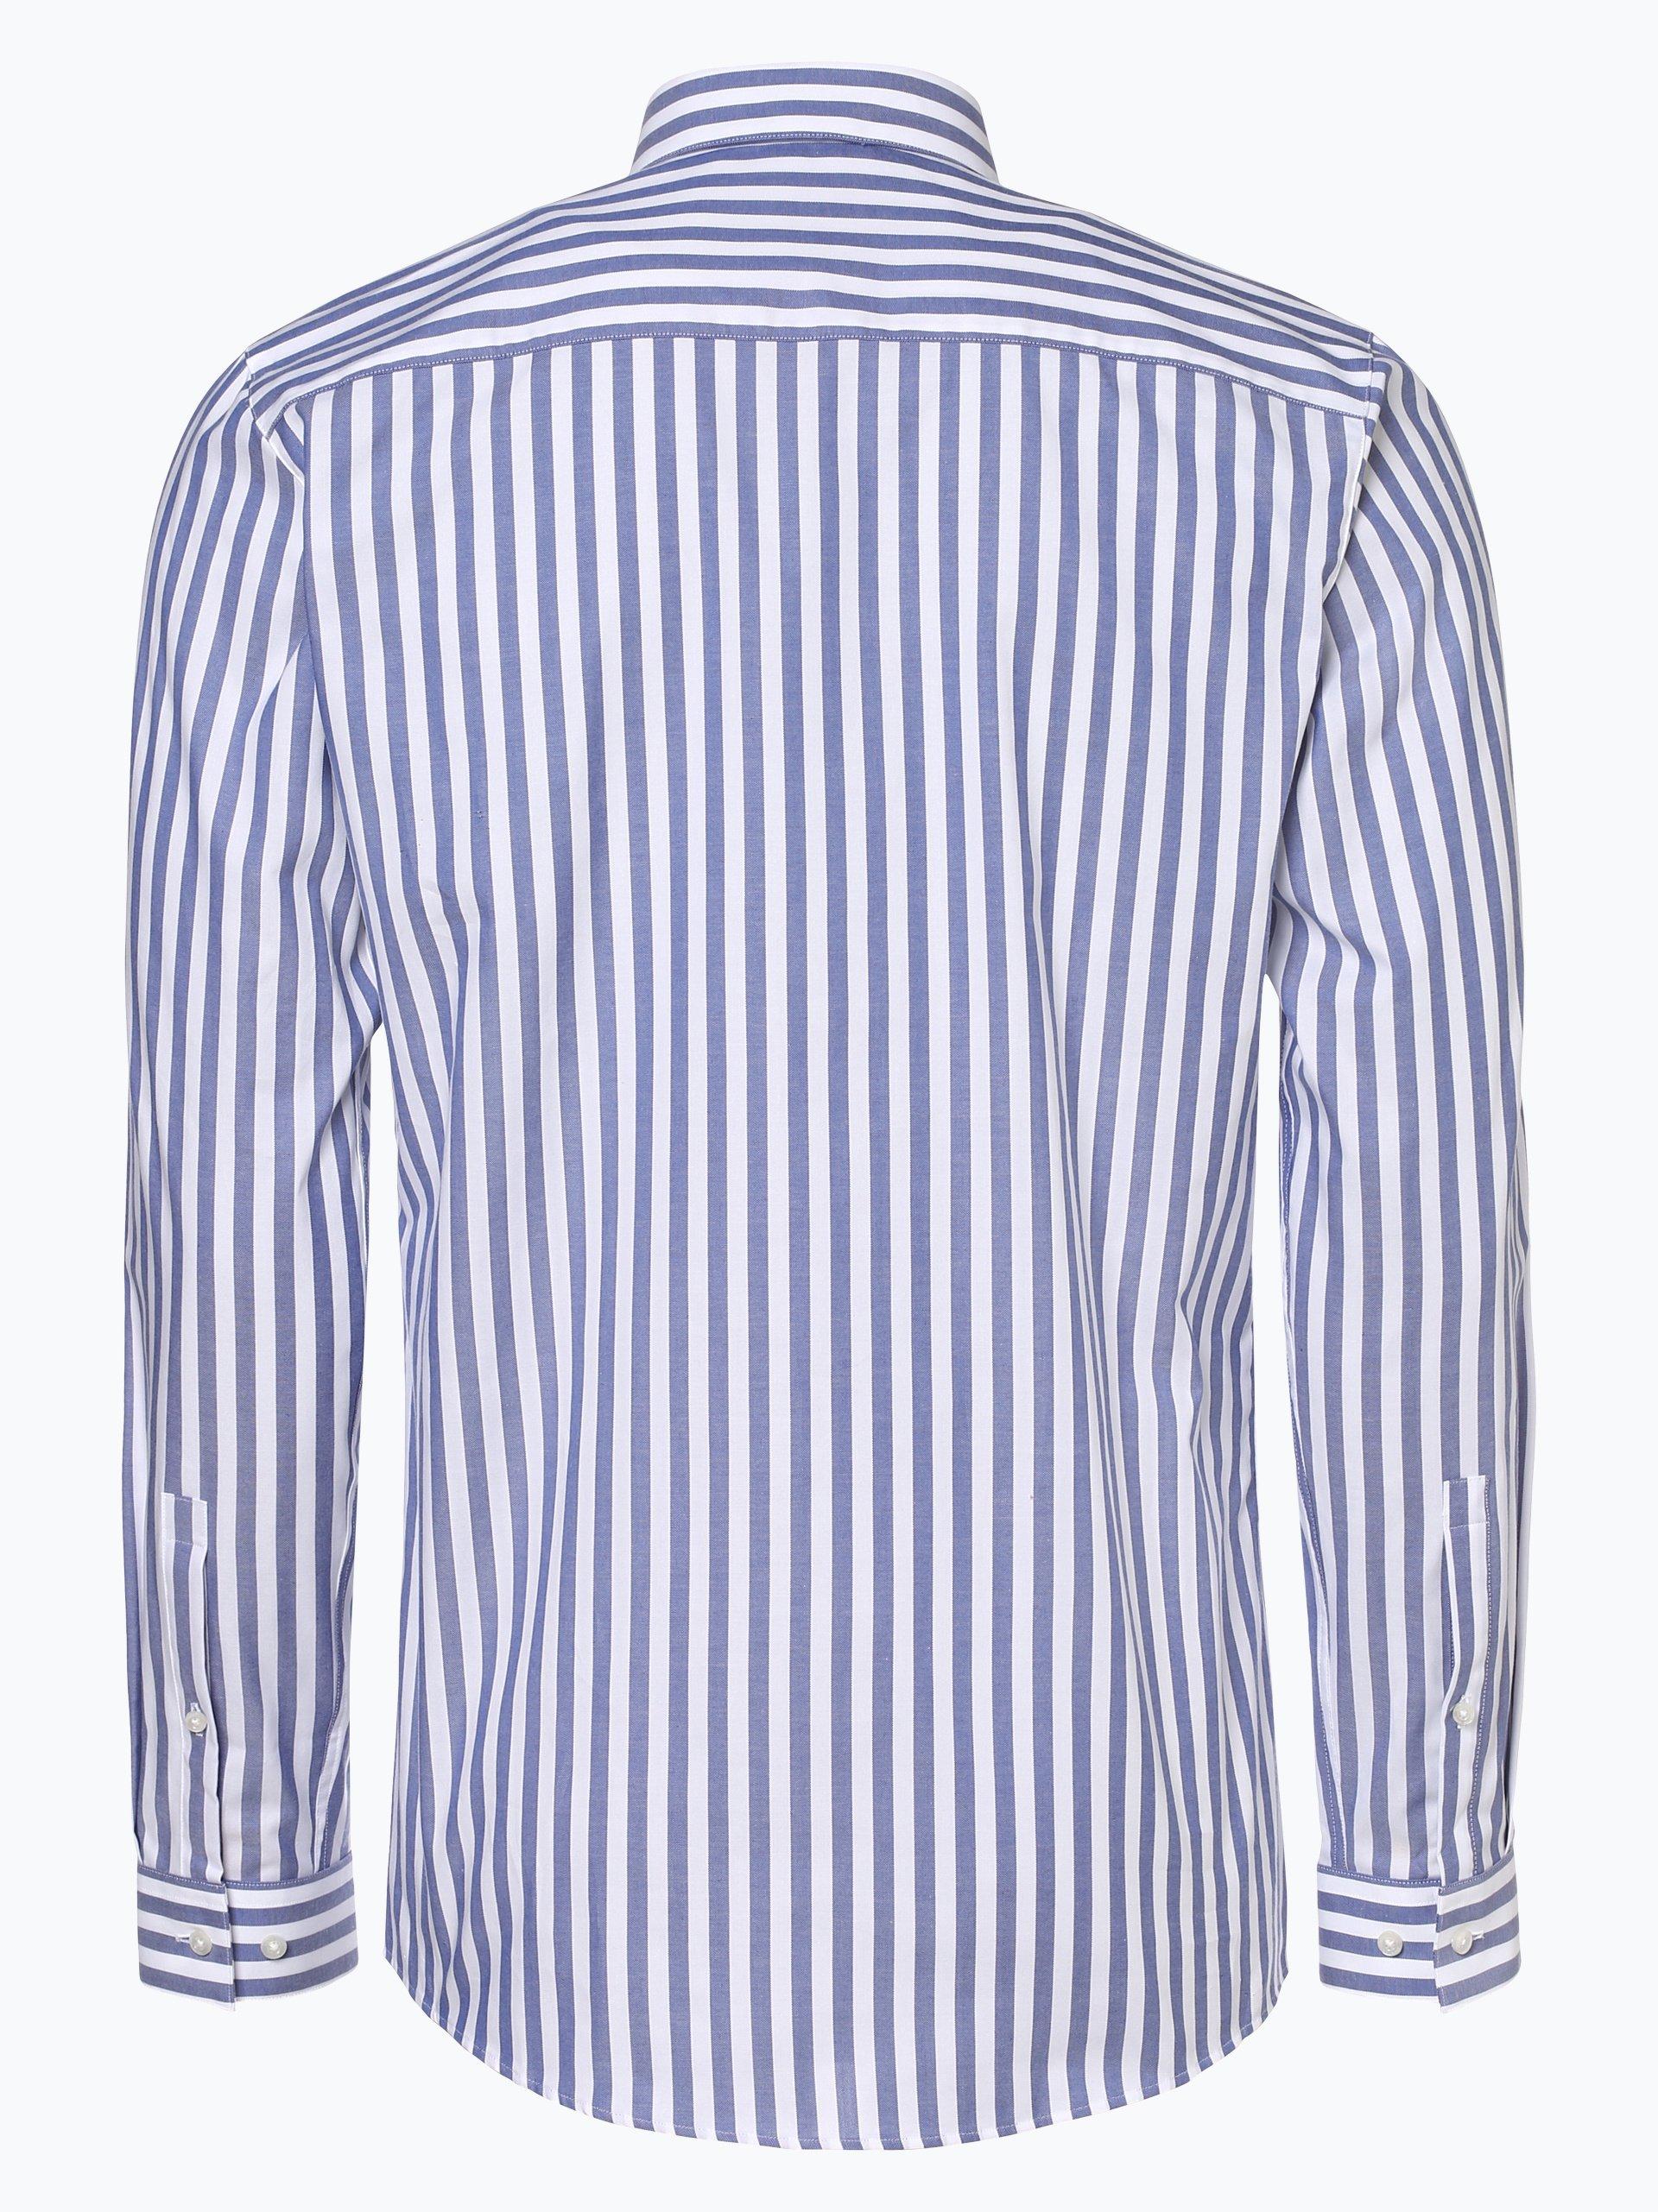 HUGO Herren Hemd - Bügelleicht - Erondo